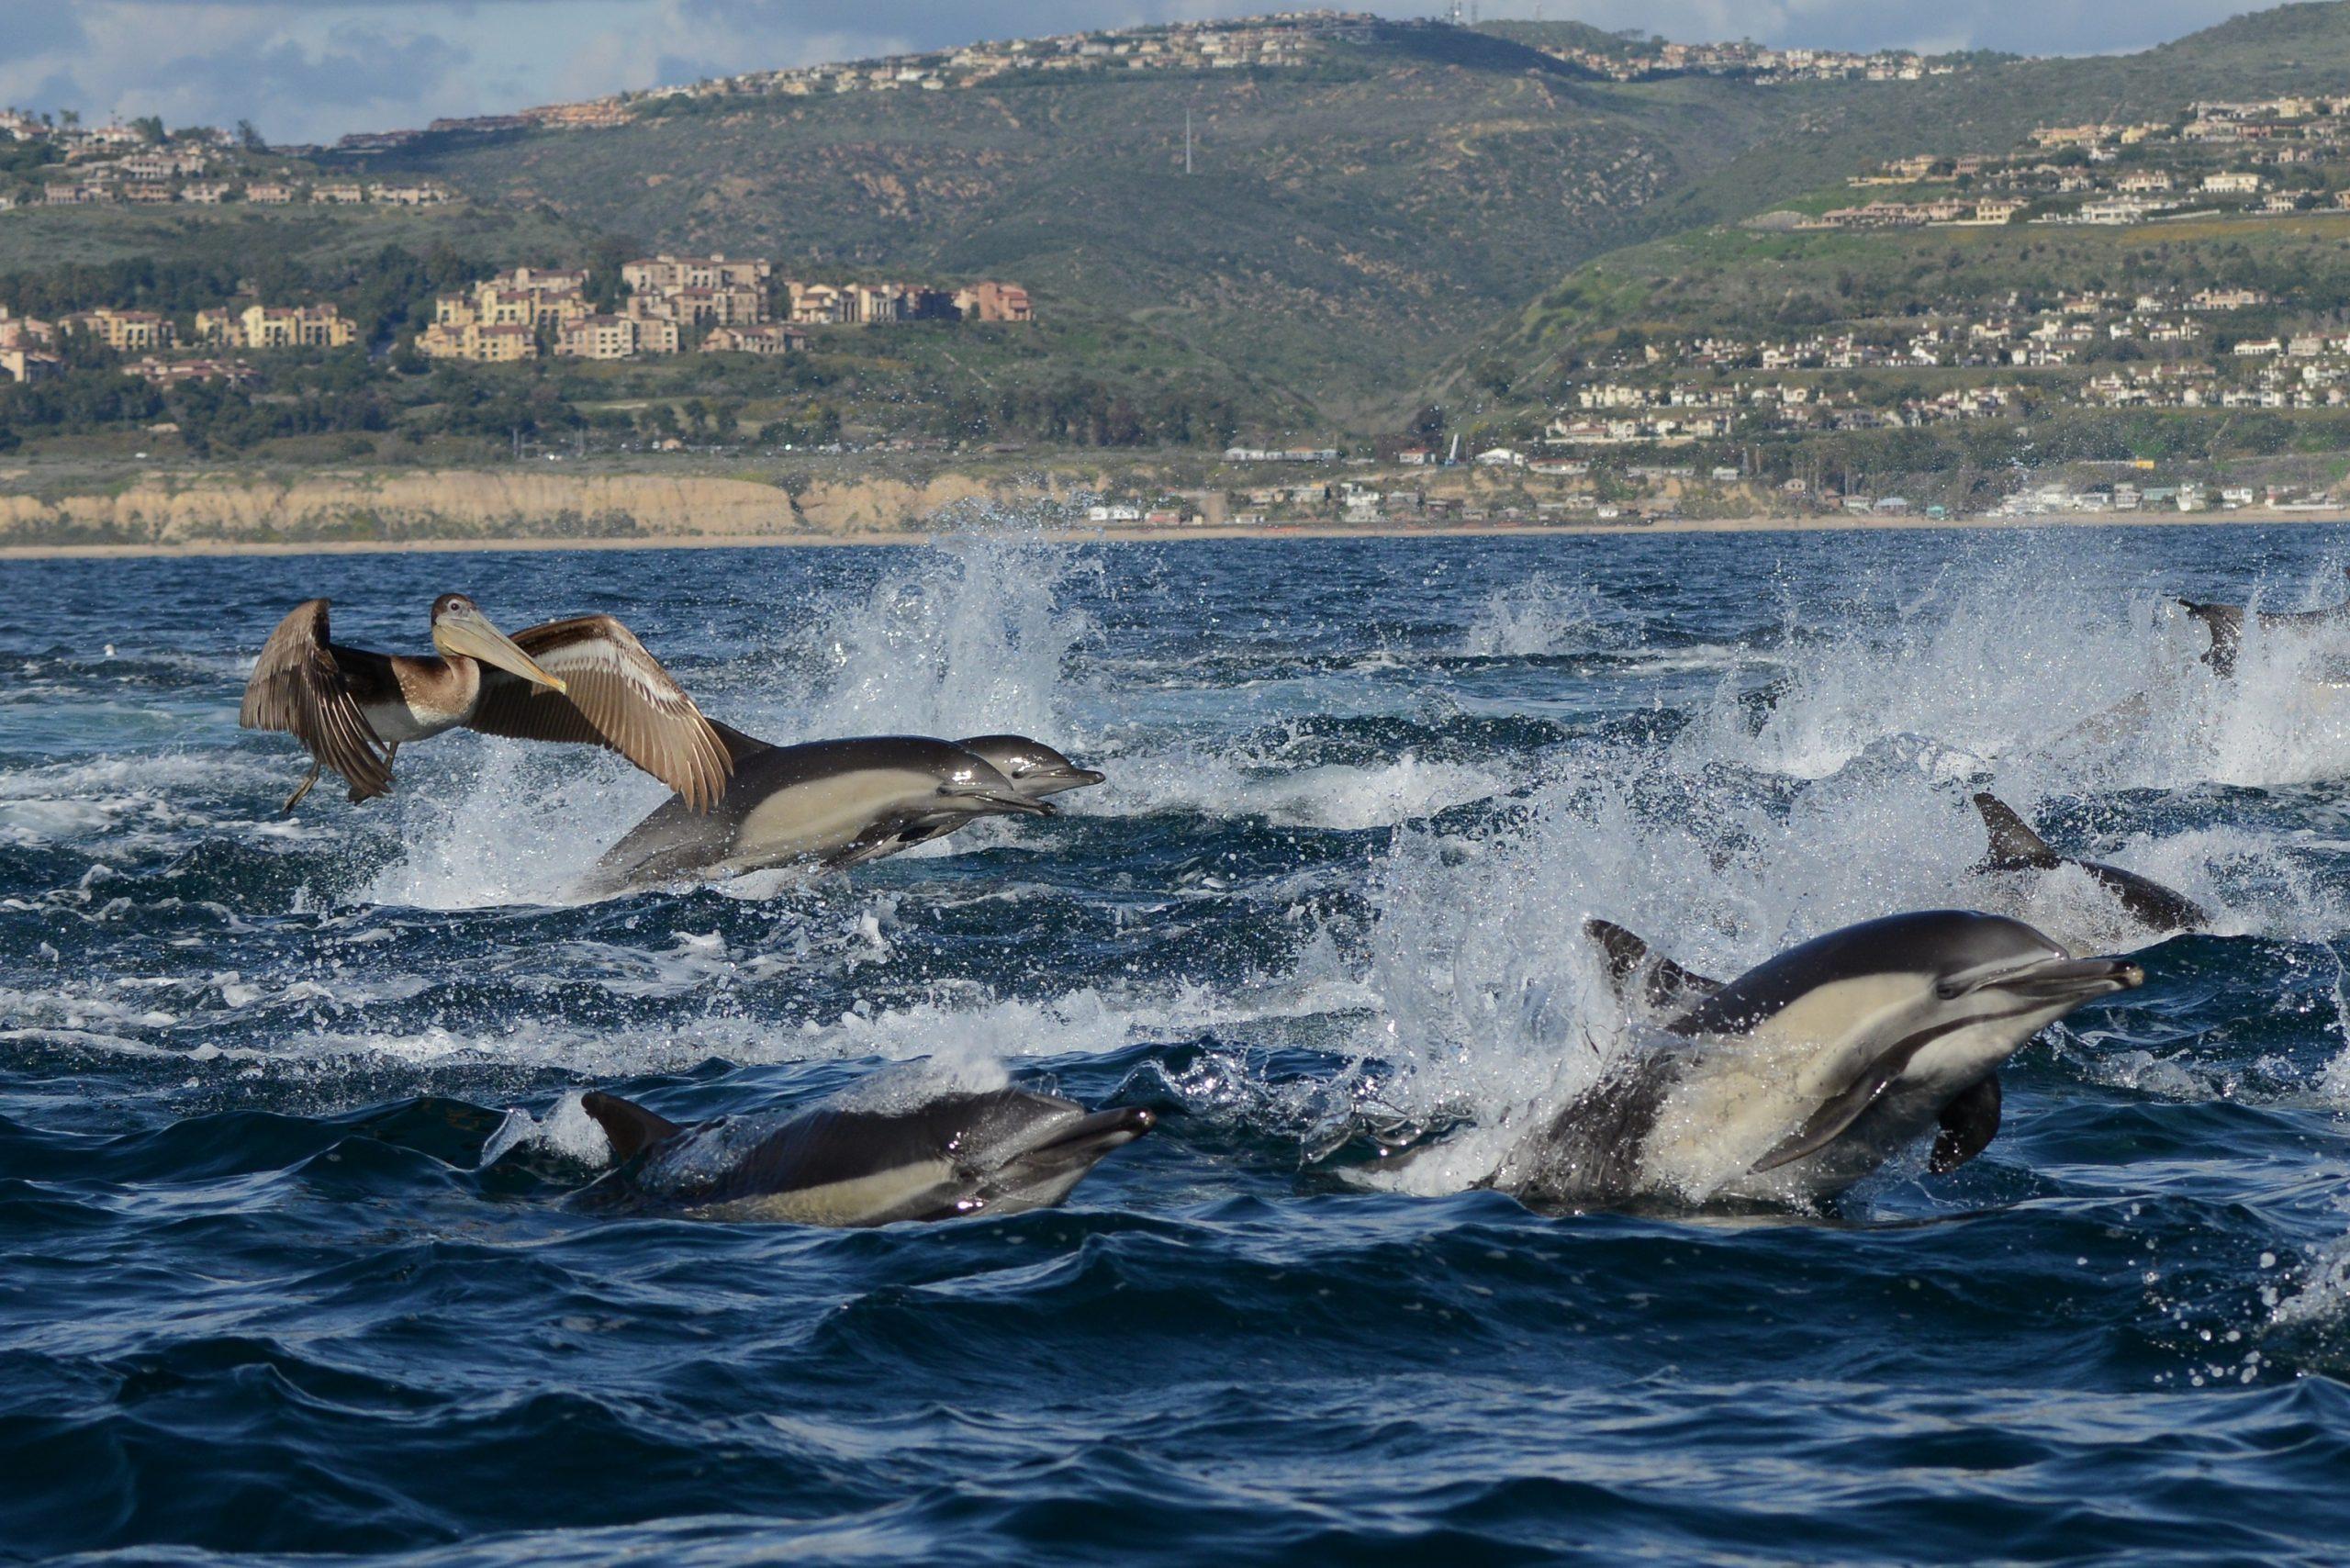 Newport Beach Whale Watching Newport Landing Davey's Locker Pelicans and Dolphins